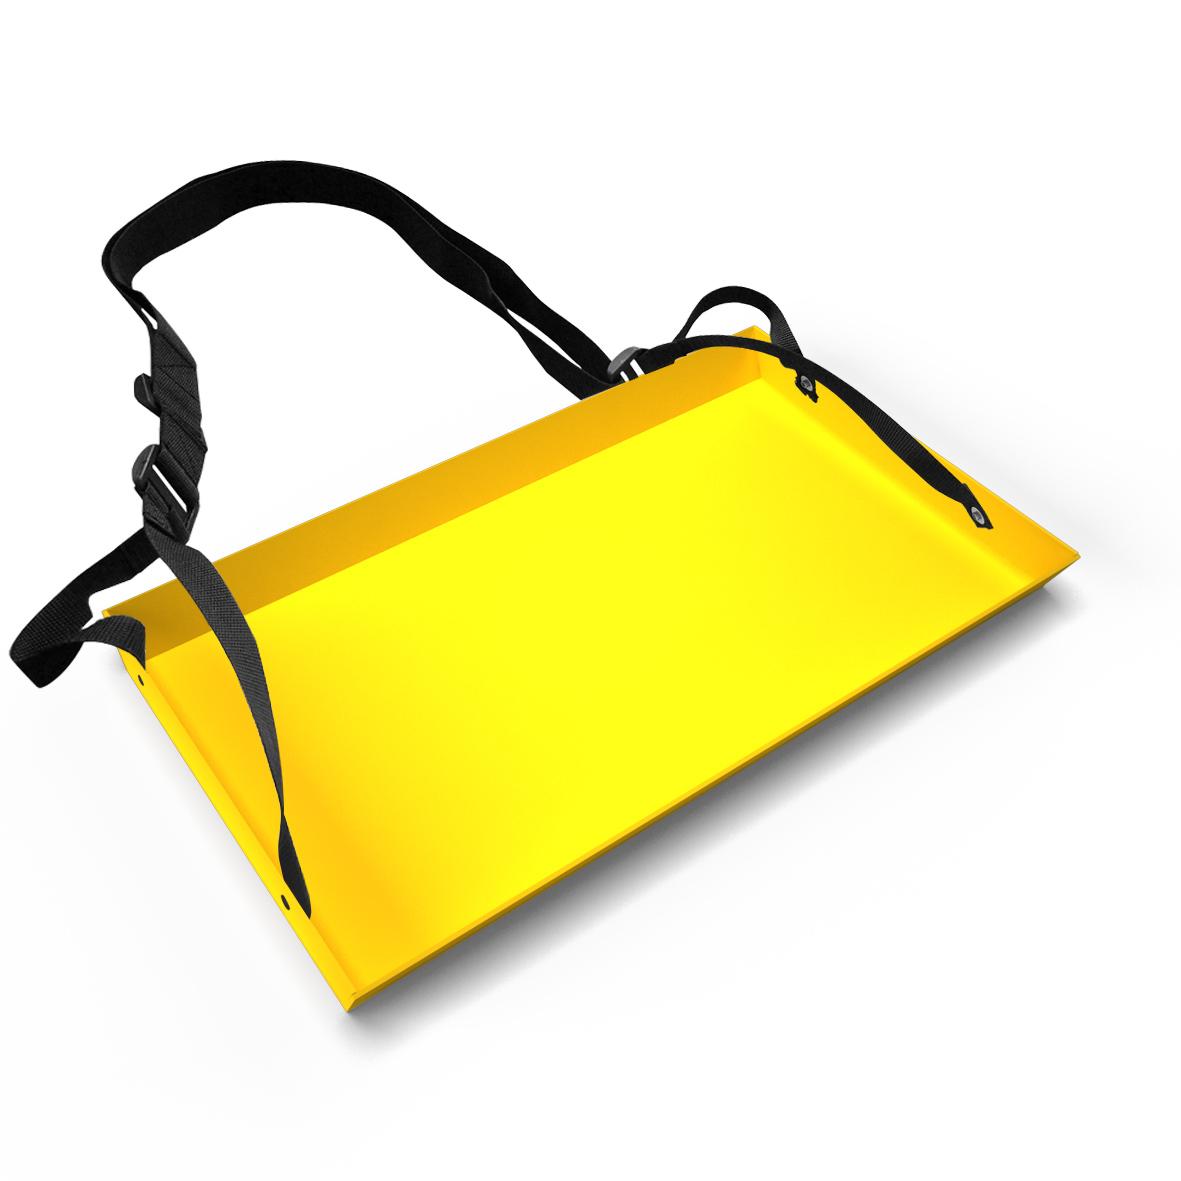 POP-LAYS-Promo-Berretto-JT160415-yellow.jpg